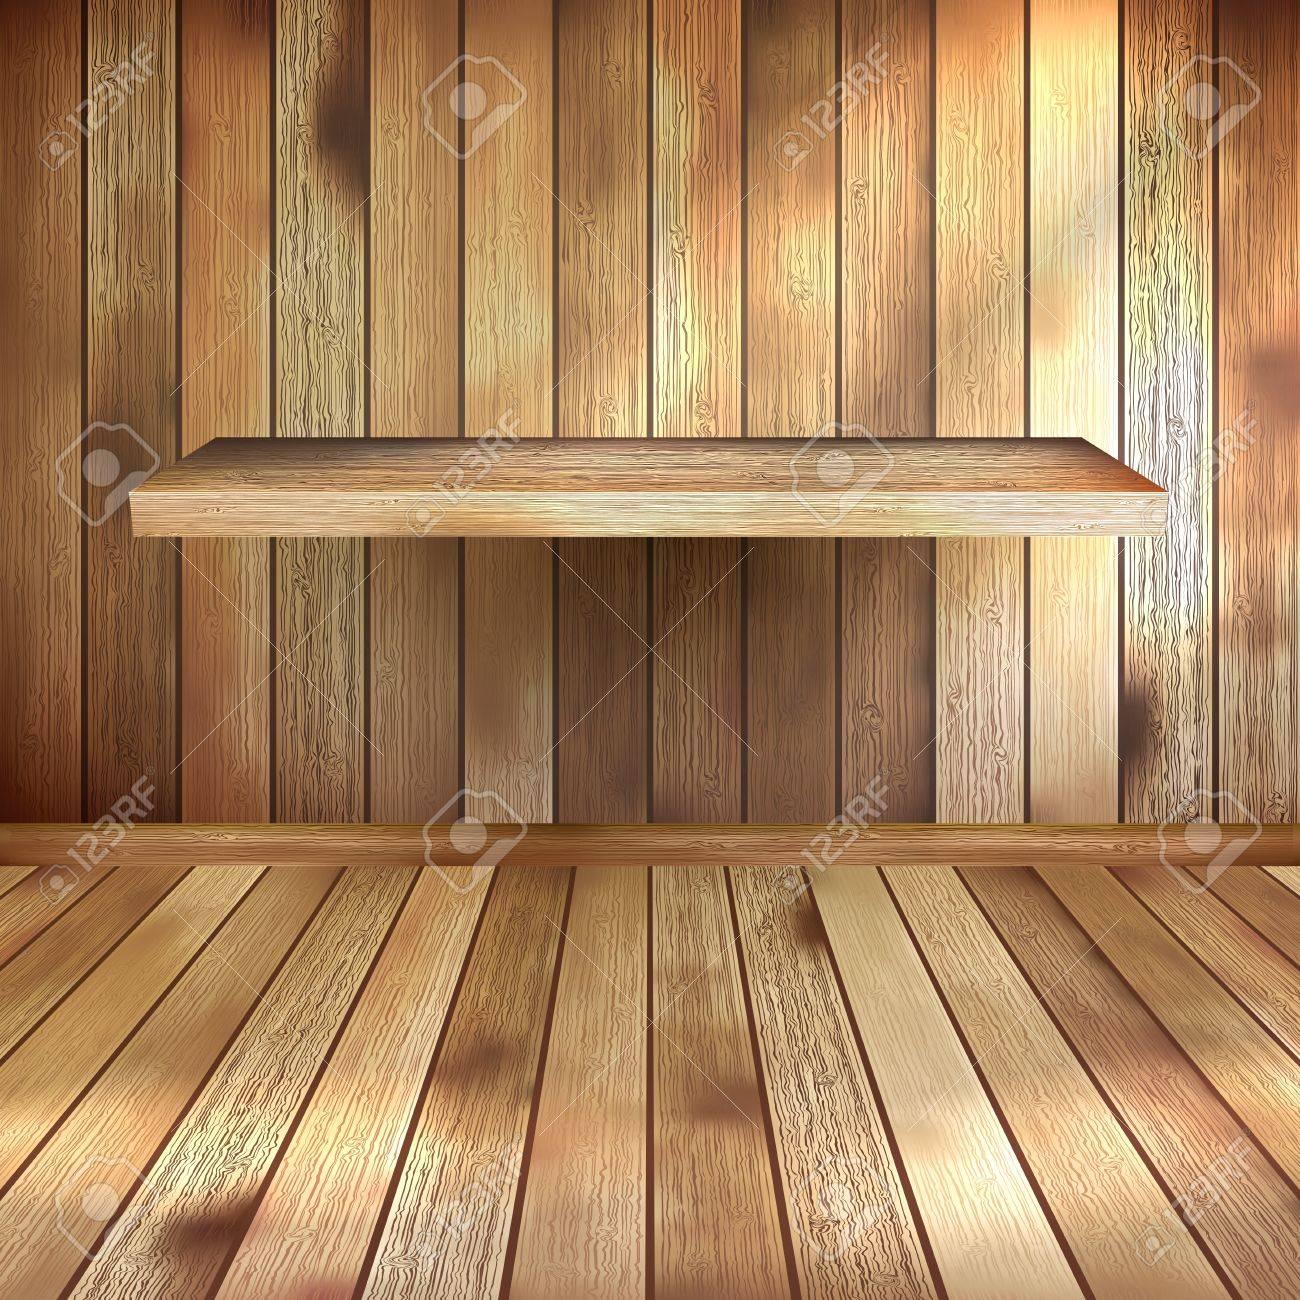 Interior wooden shelves free vector - Empty Interior With Wood Shelf Eps 10 Stock Vector 20274960